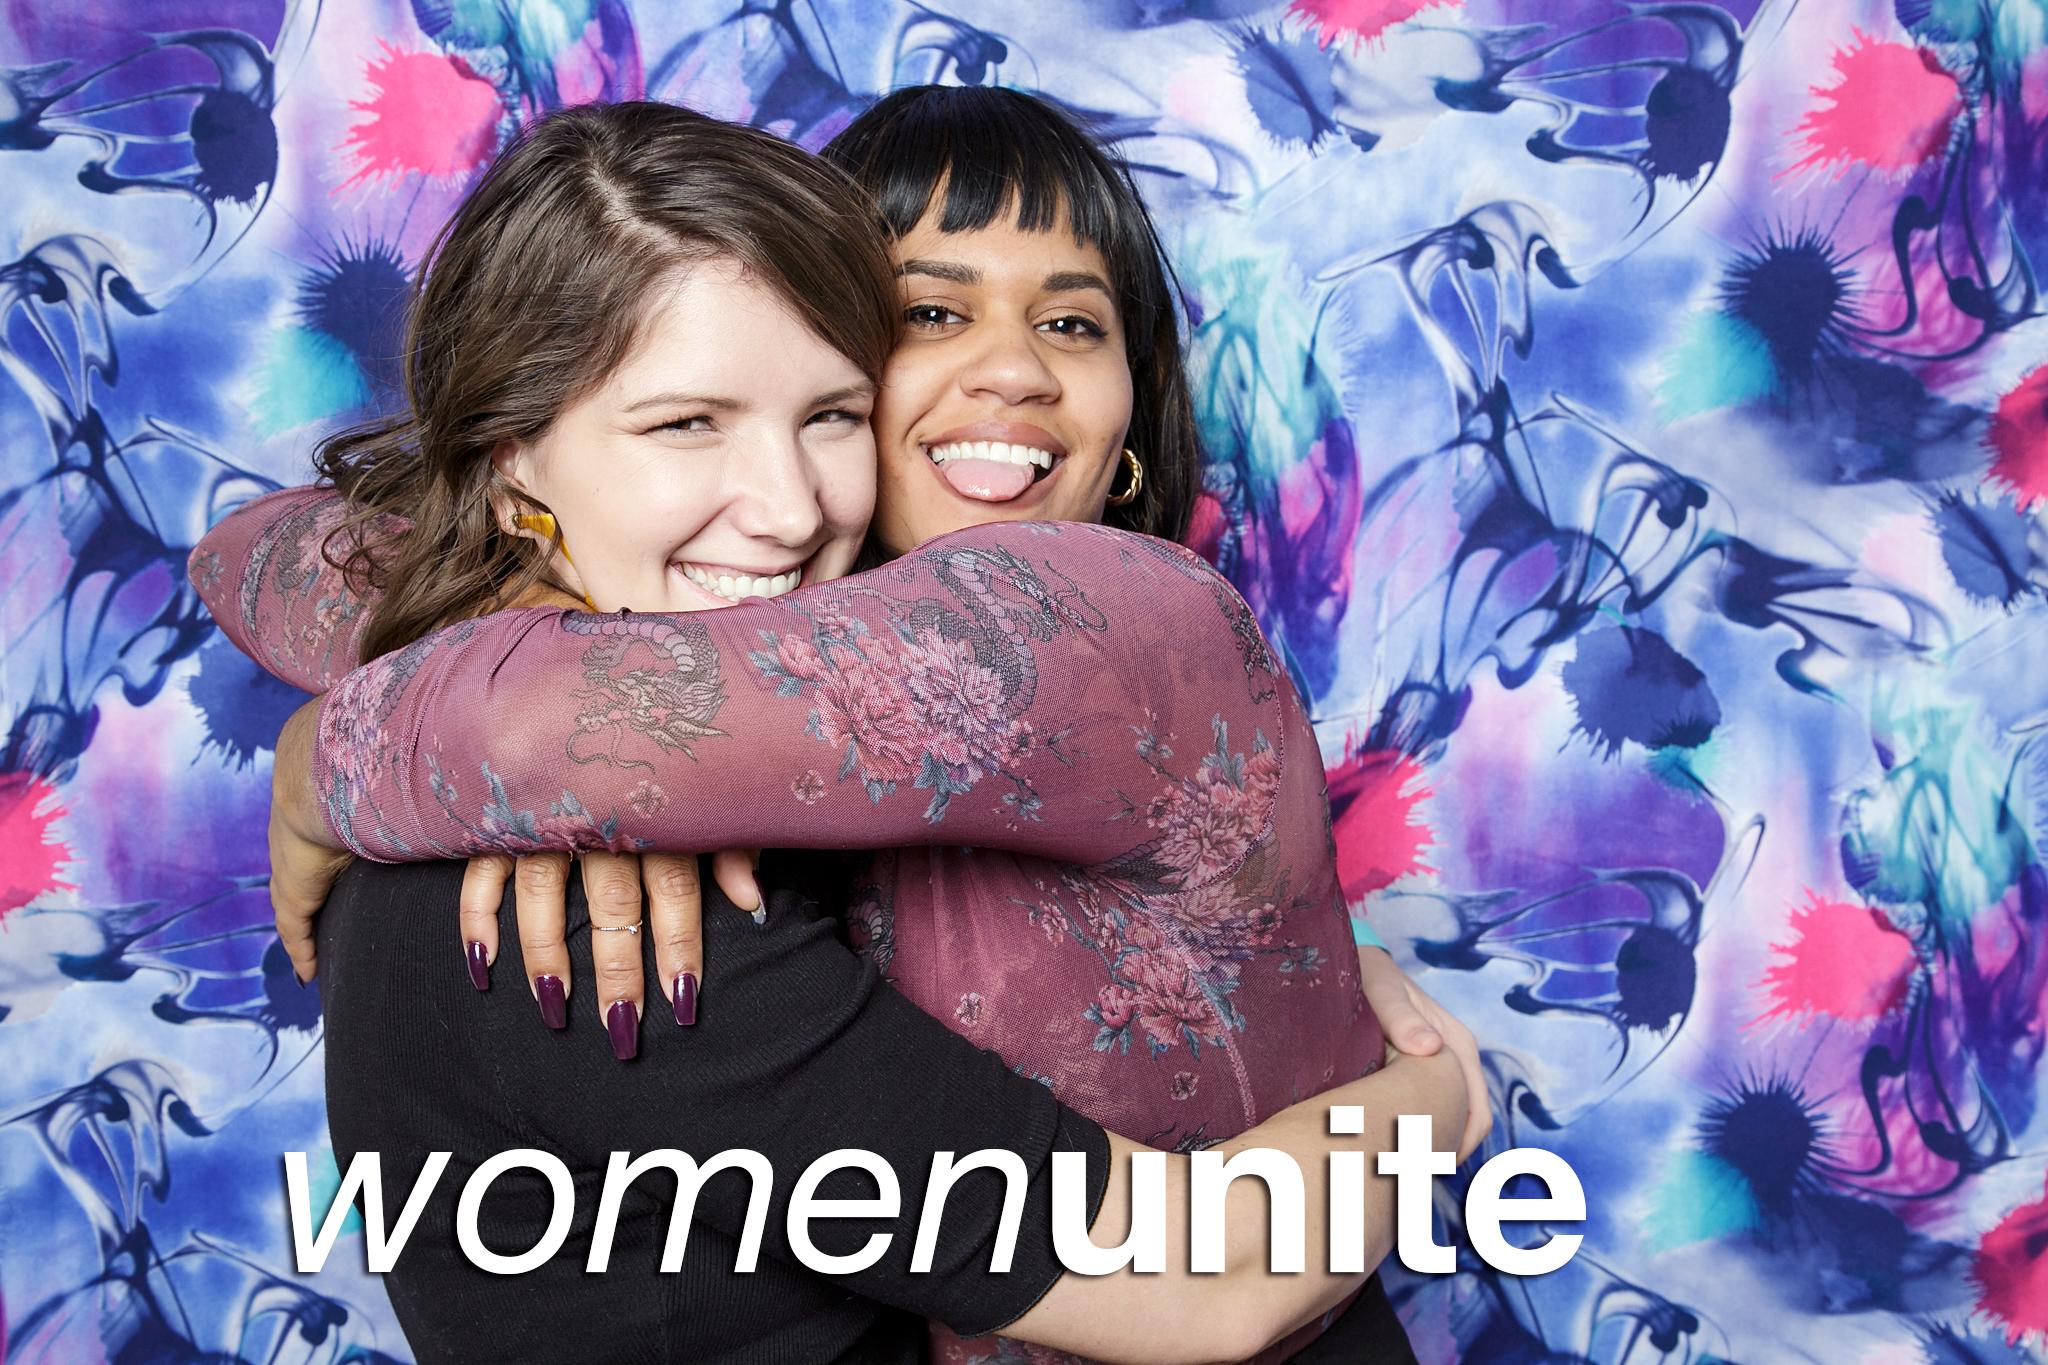 glitterguts photobooth portraits from women unite at hairpin arts, chicago 2019